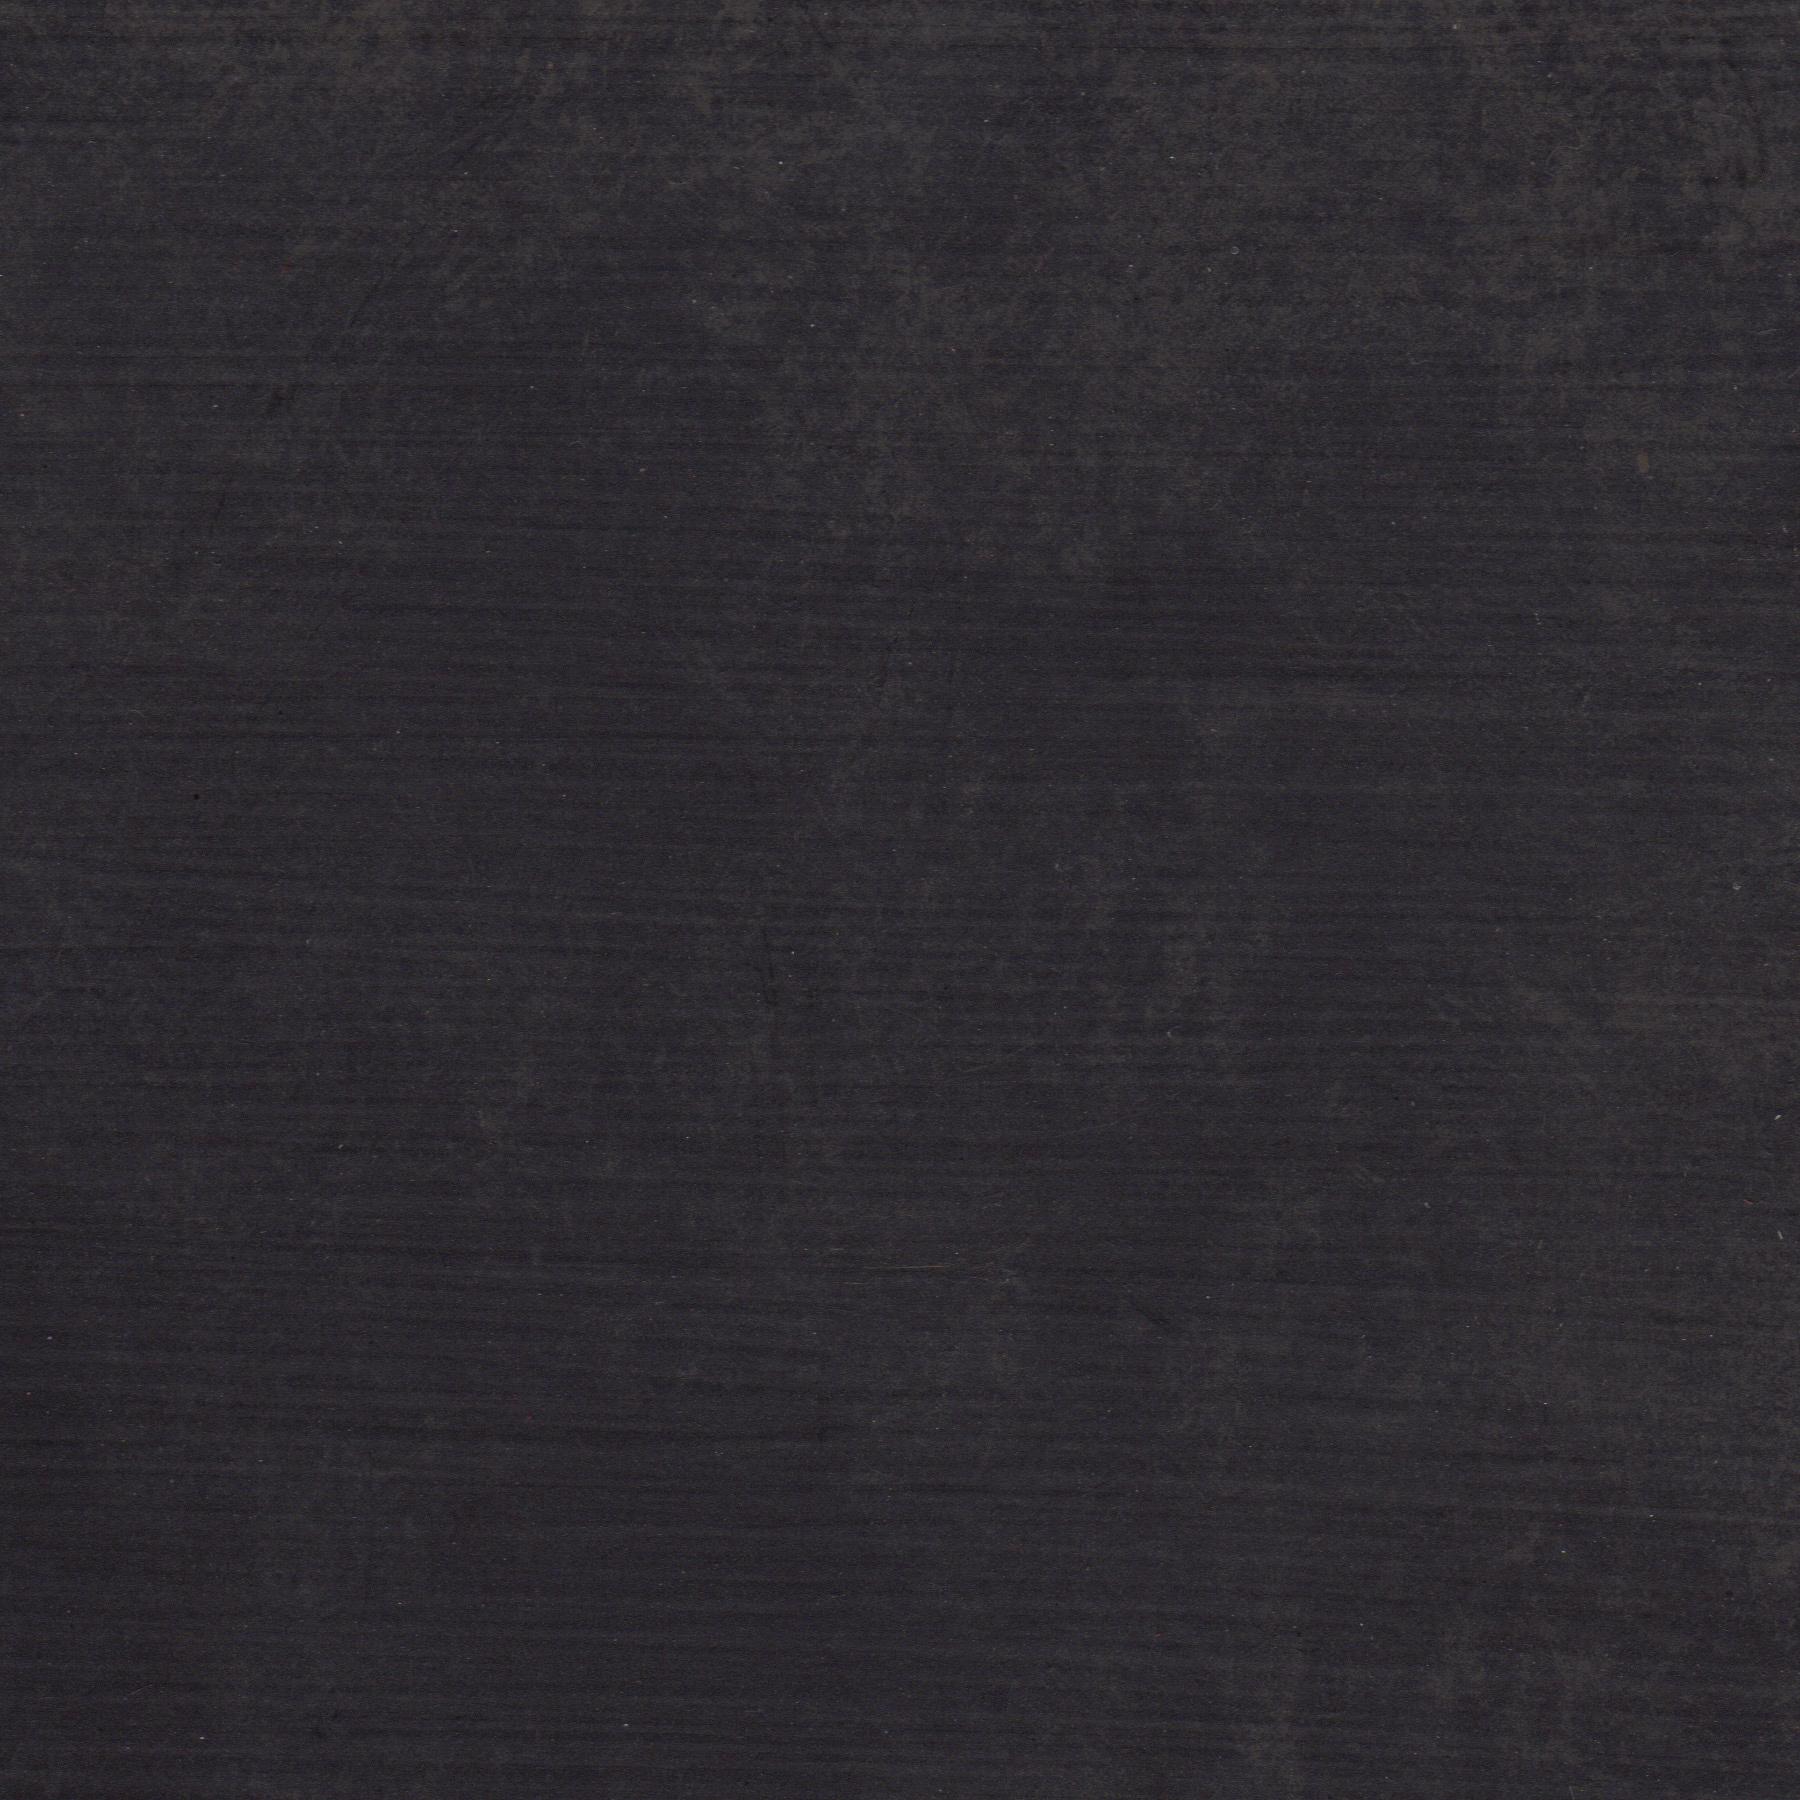 Tetra Negra